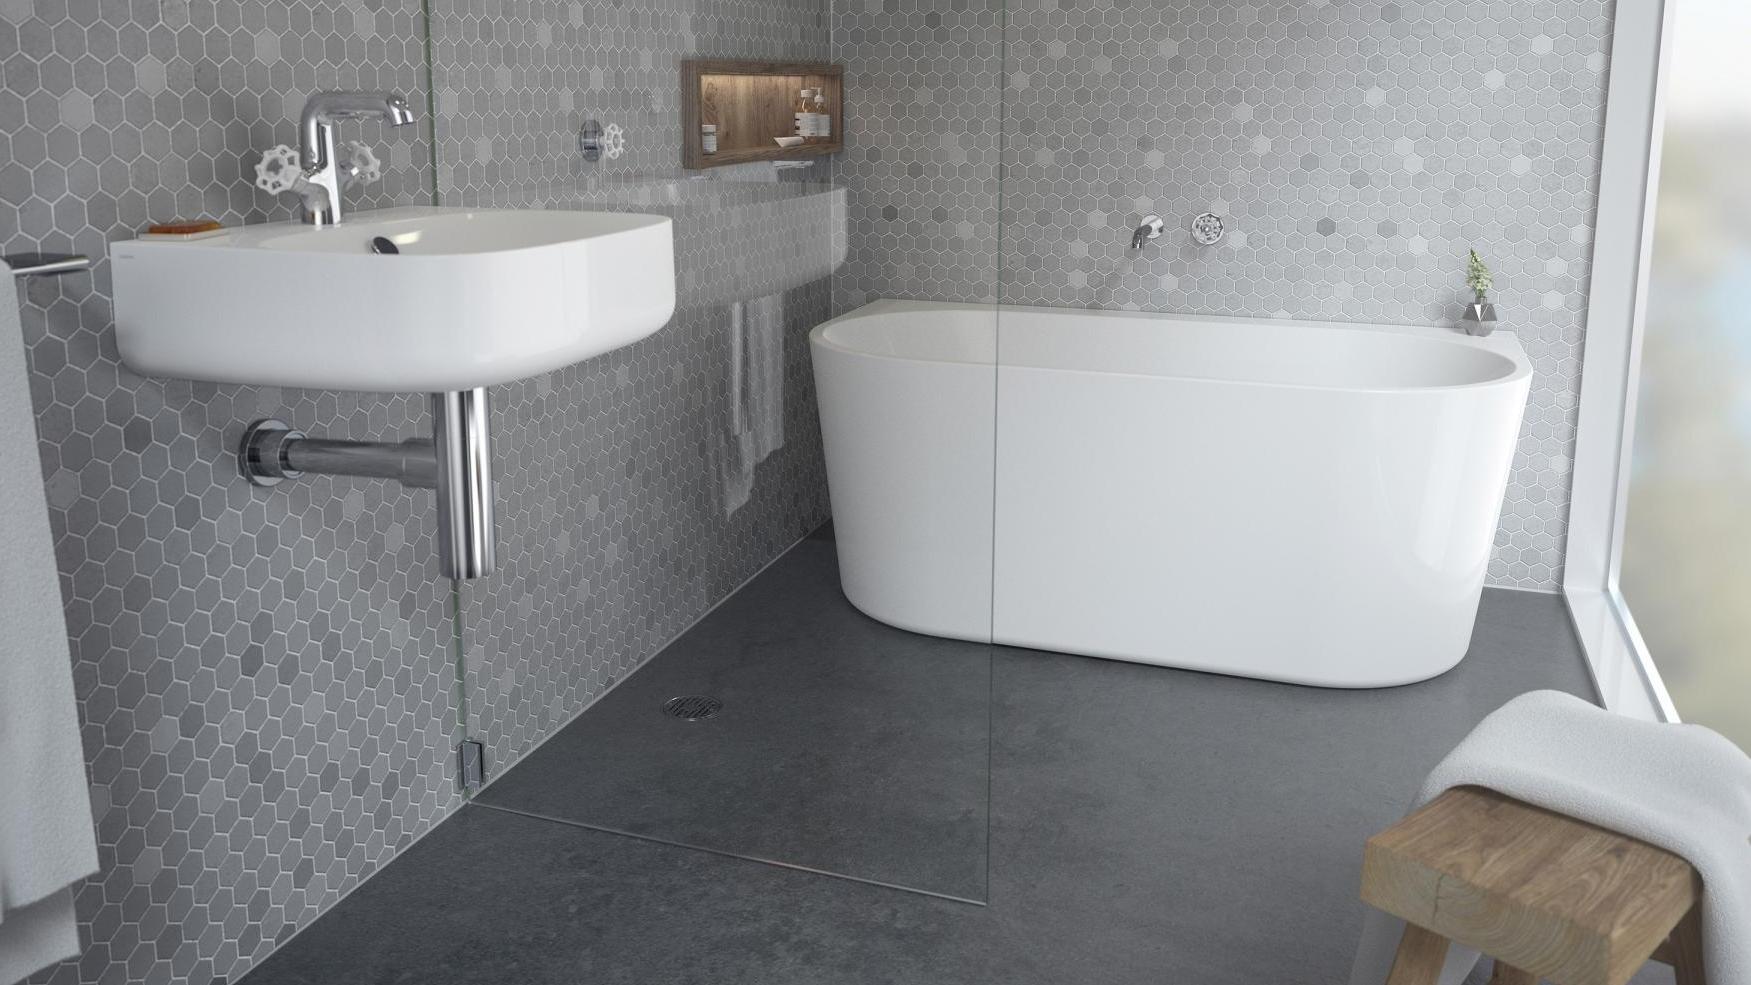 Buy Caroma Aura 1600mm Back to Wall Freestanding Bath | Harvey Norman AU